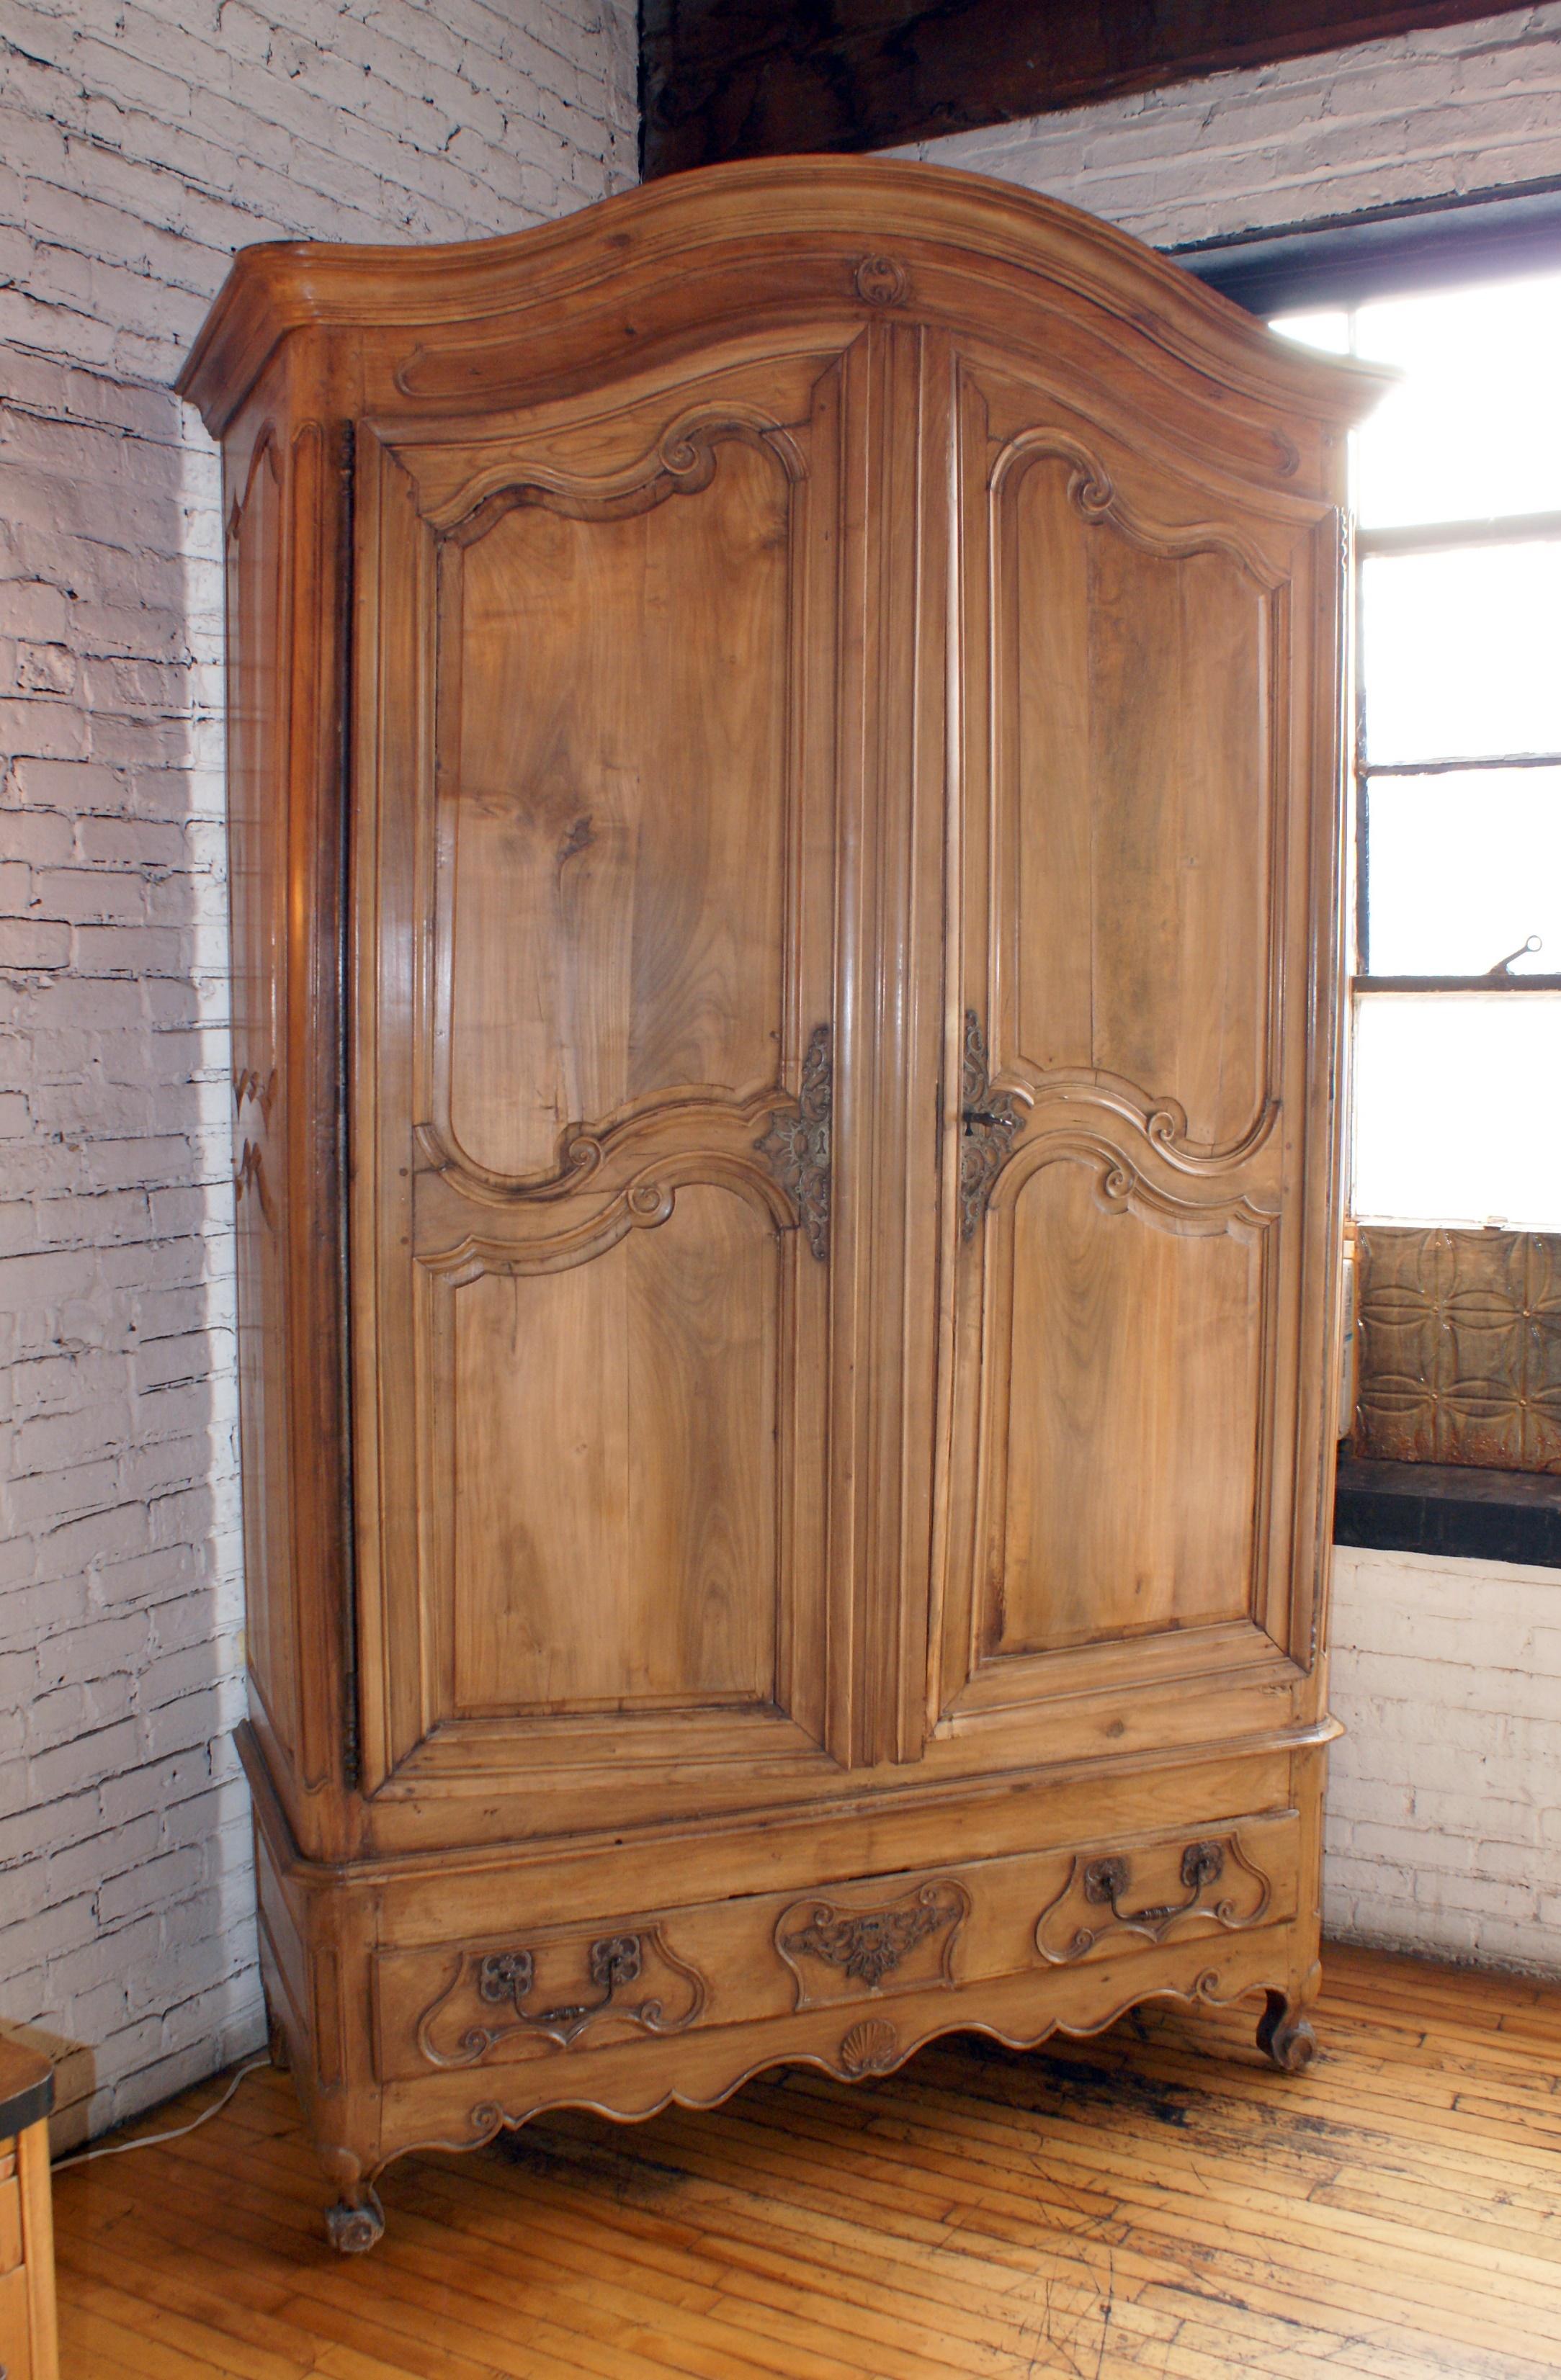 Etonnant Large 18th Century French Armoire